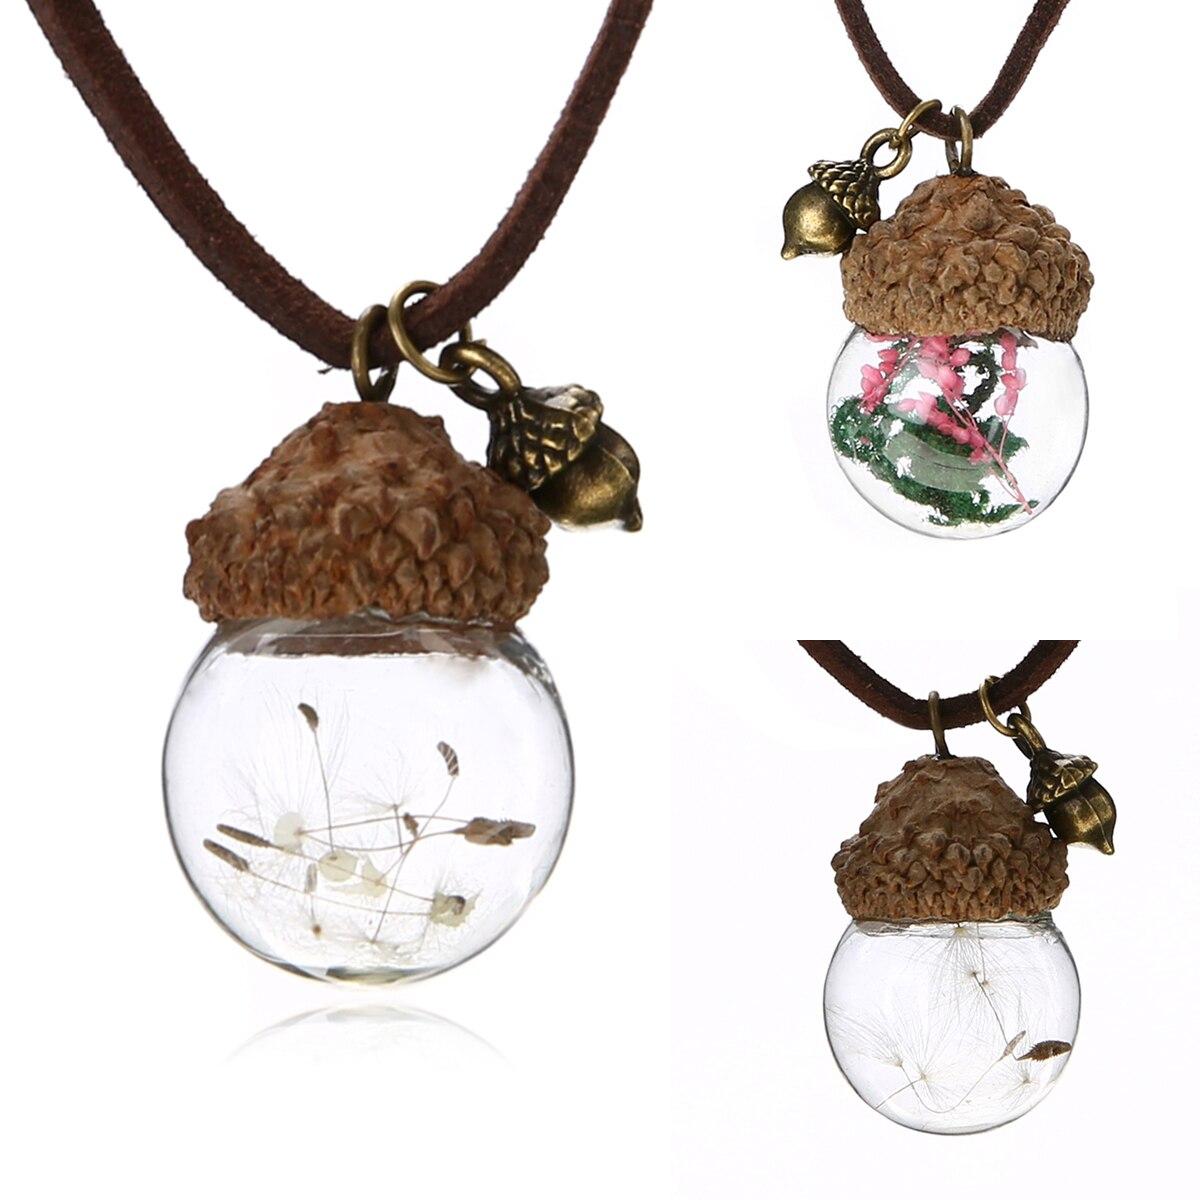 Collar de Bellota de bola de cristal de moda collar de goma laca duro diente de león flor colgante collar de joyería vintage Femme Bijoux